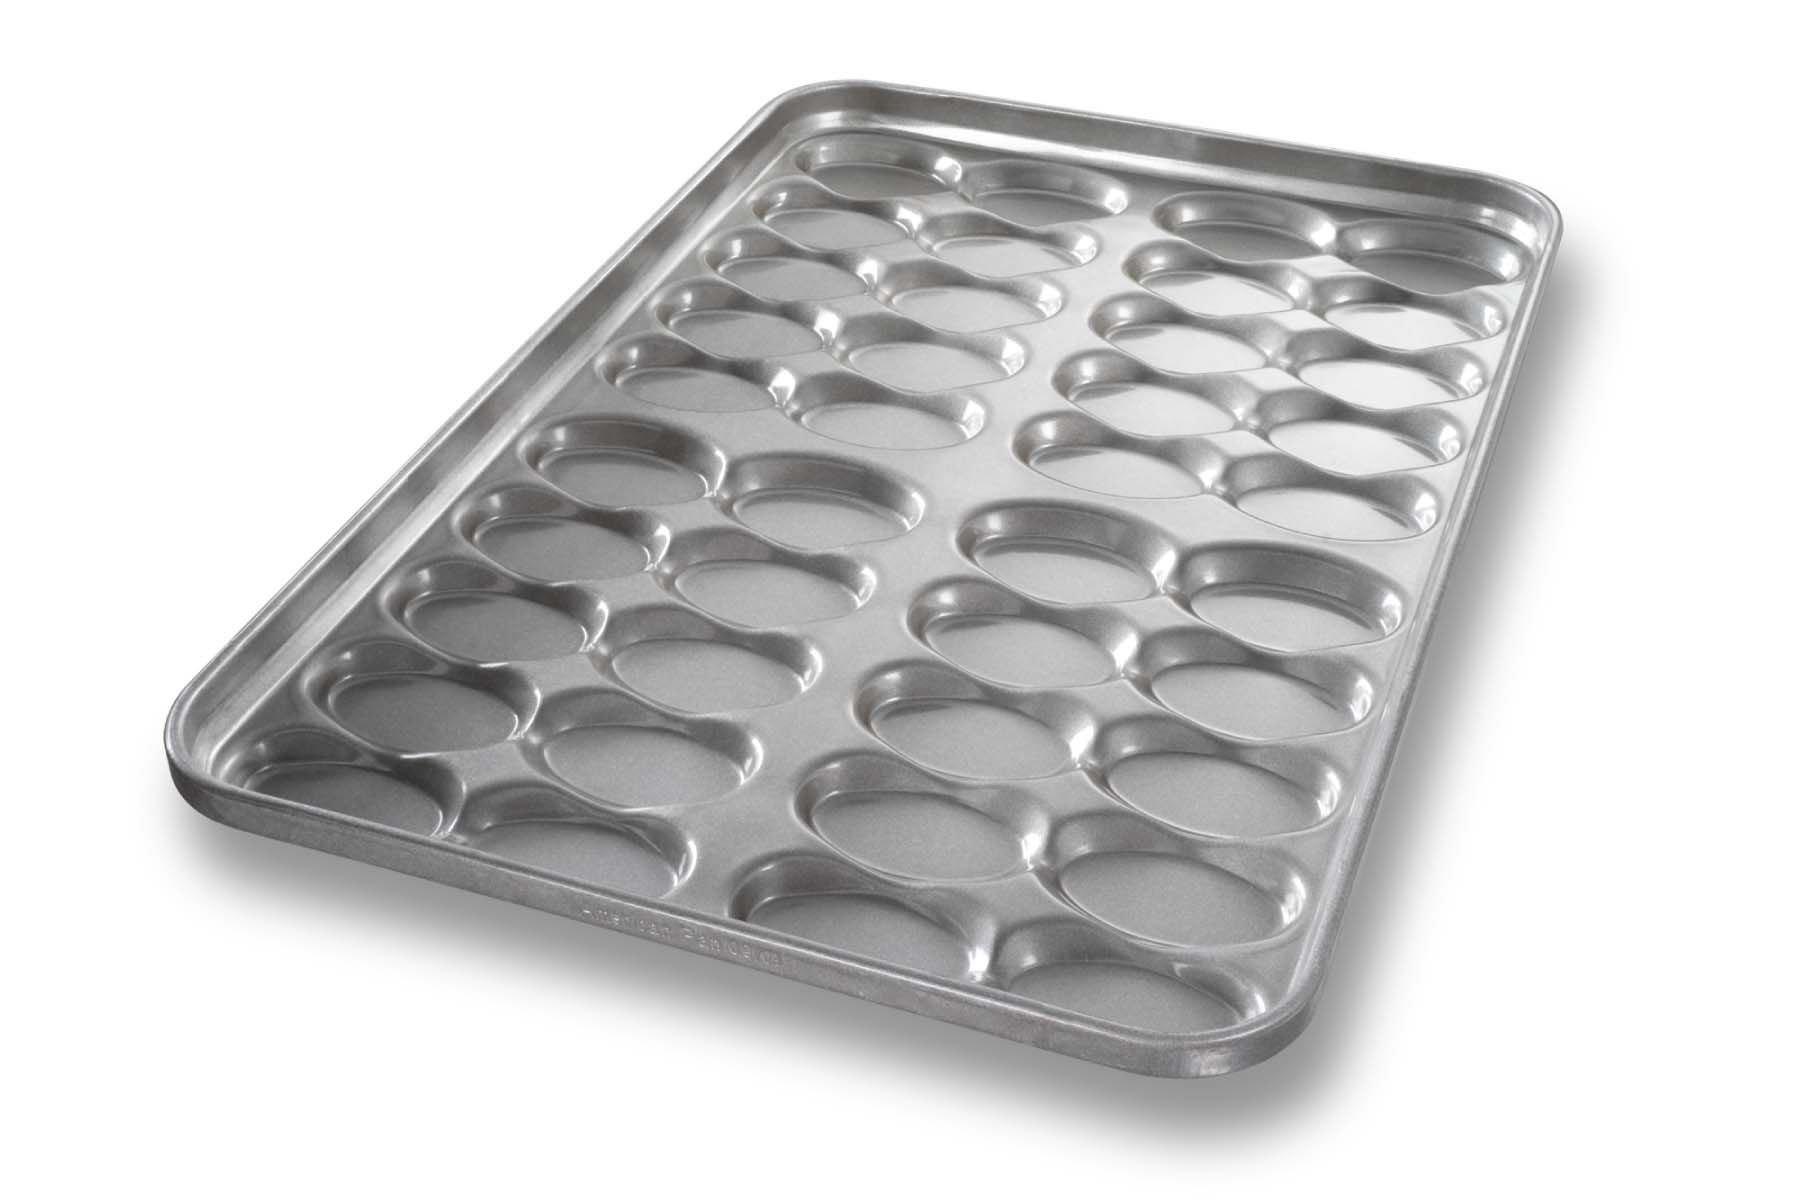 STANDARD STYLE ARTISAN DINNER ROLL PAN